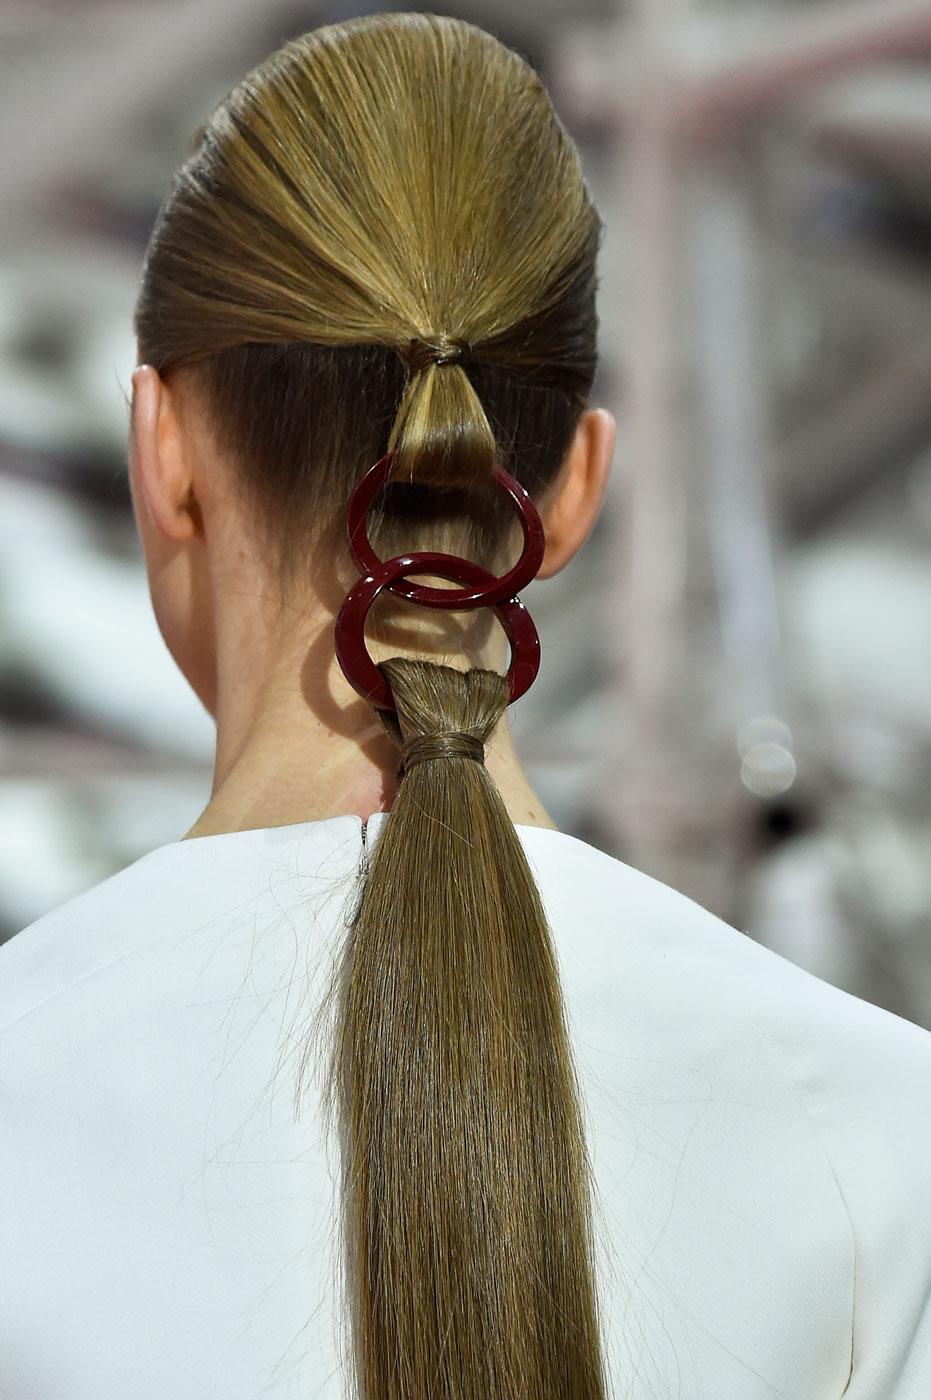 Christian-Dior-fashion-runway-show-close-ups-haute-couture-paris-spring-summer-2015-the-impression-137